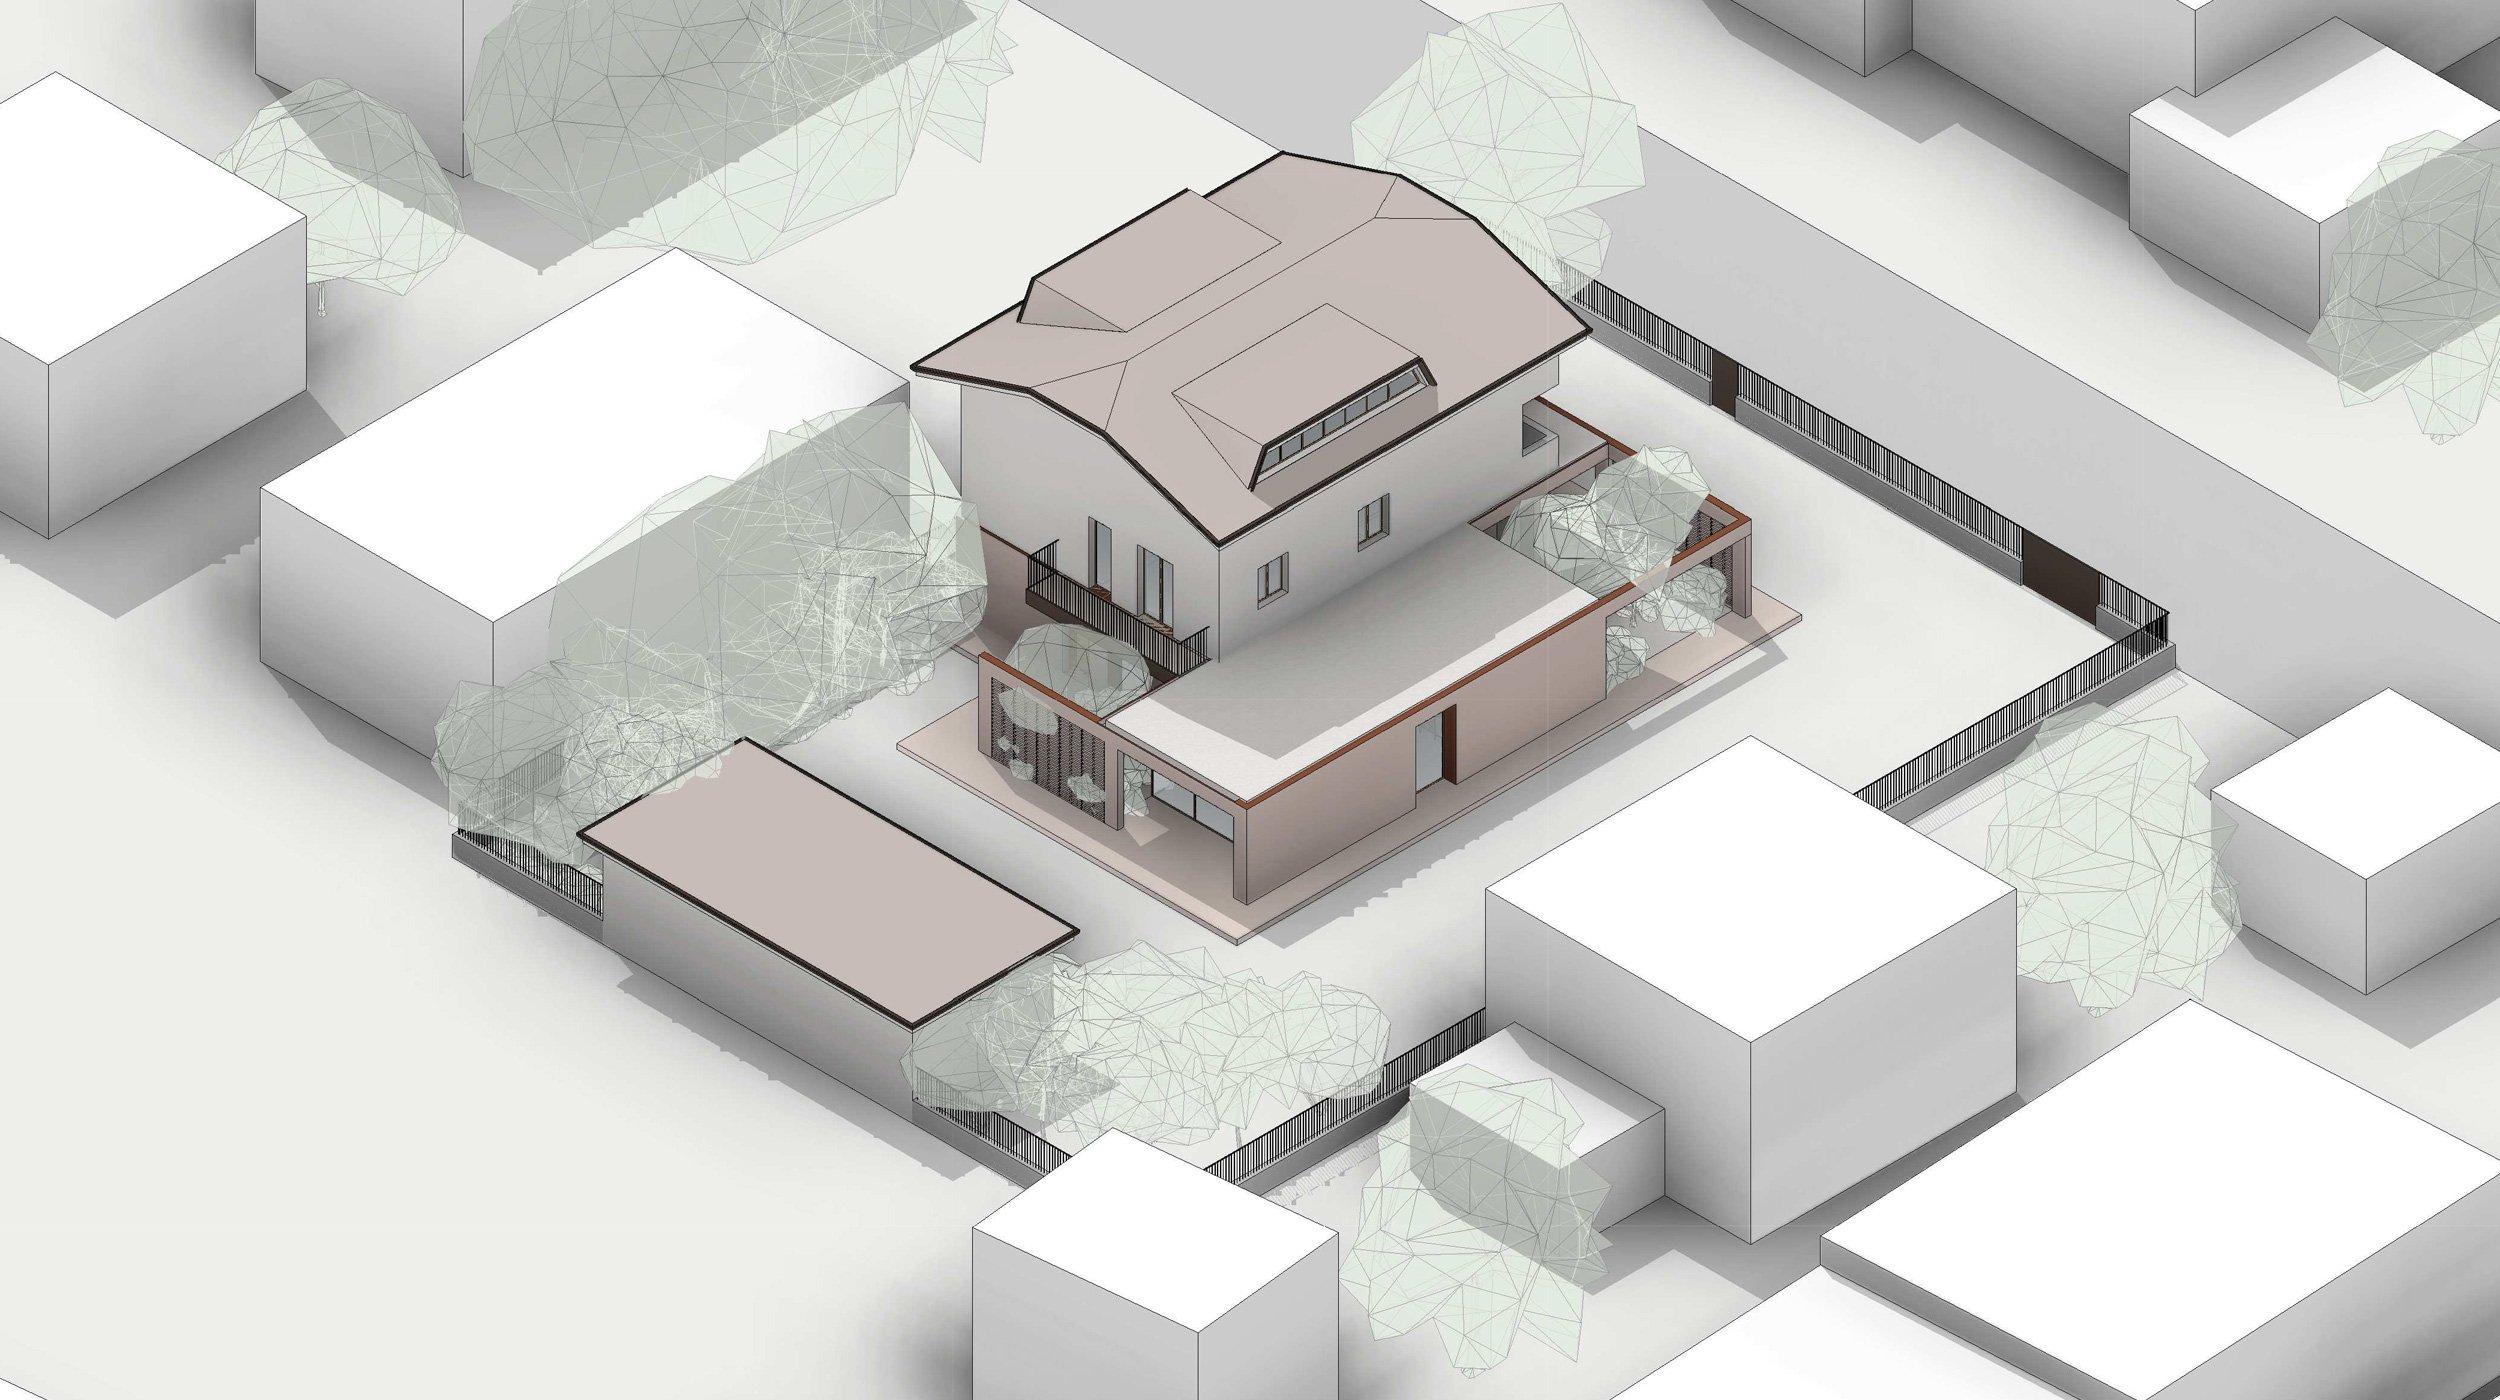 RB House - ARCHITETTURA ed INTORNI